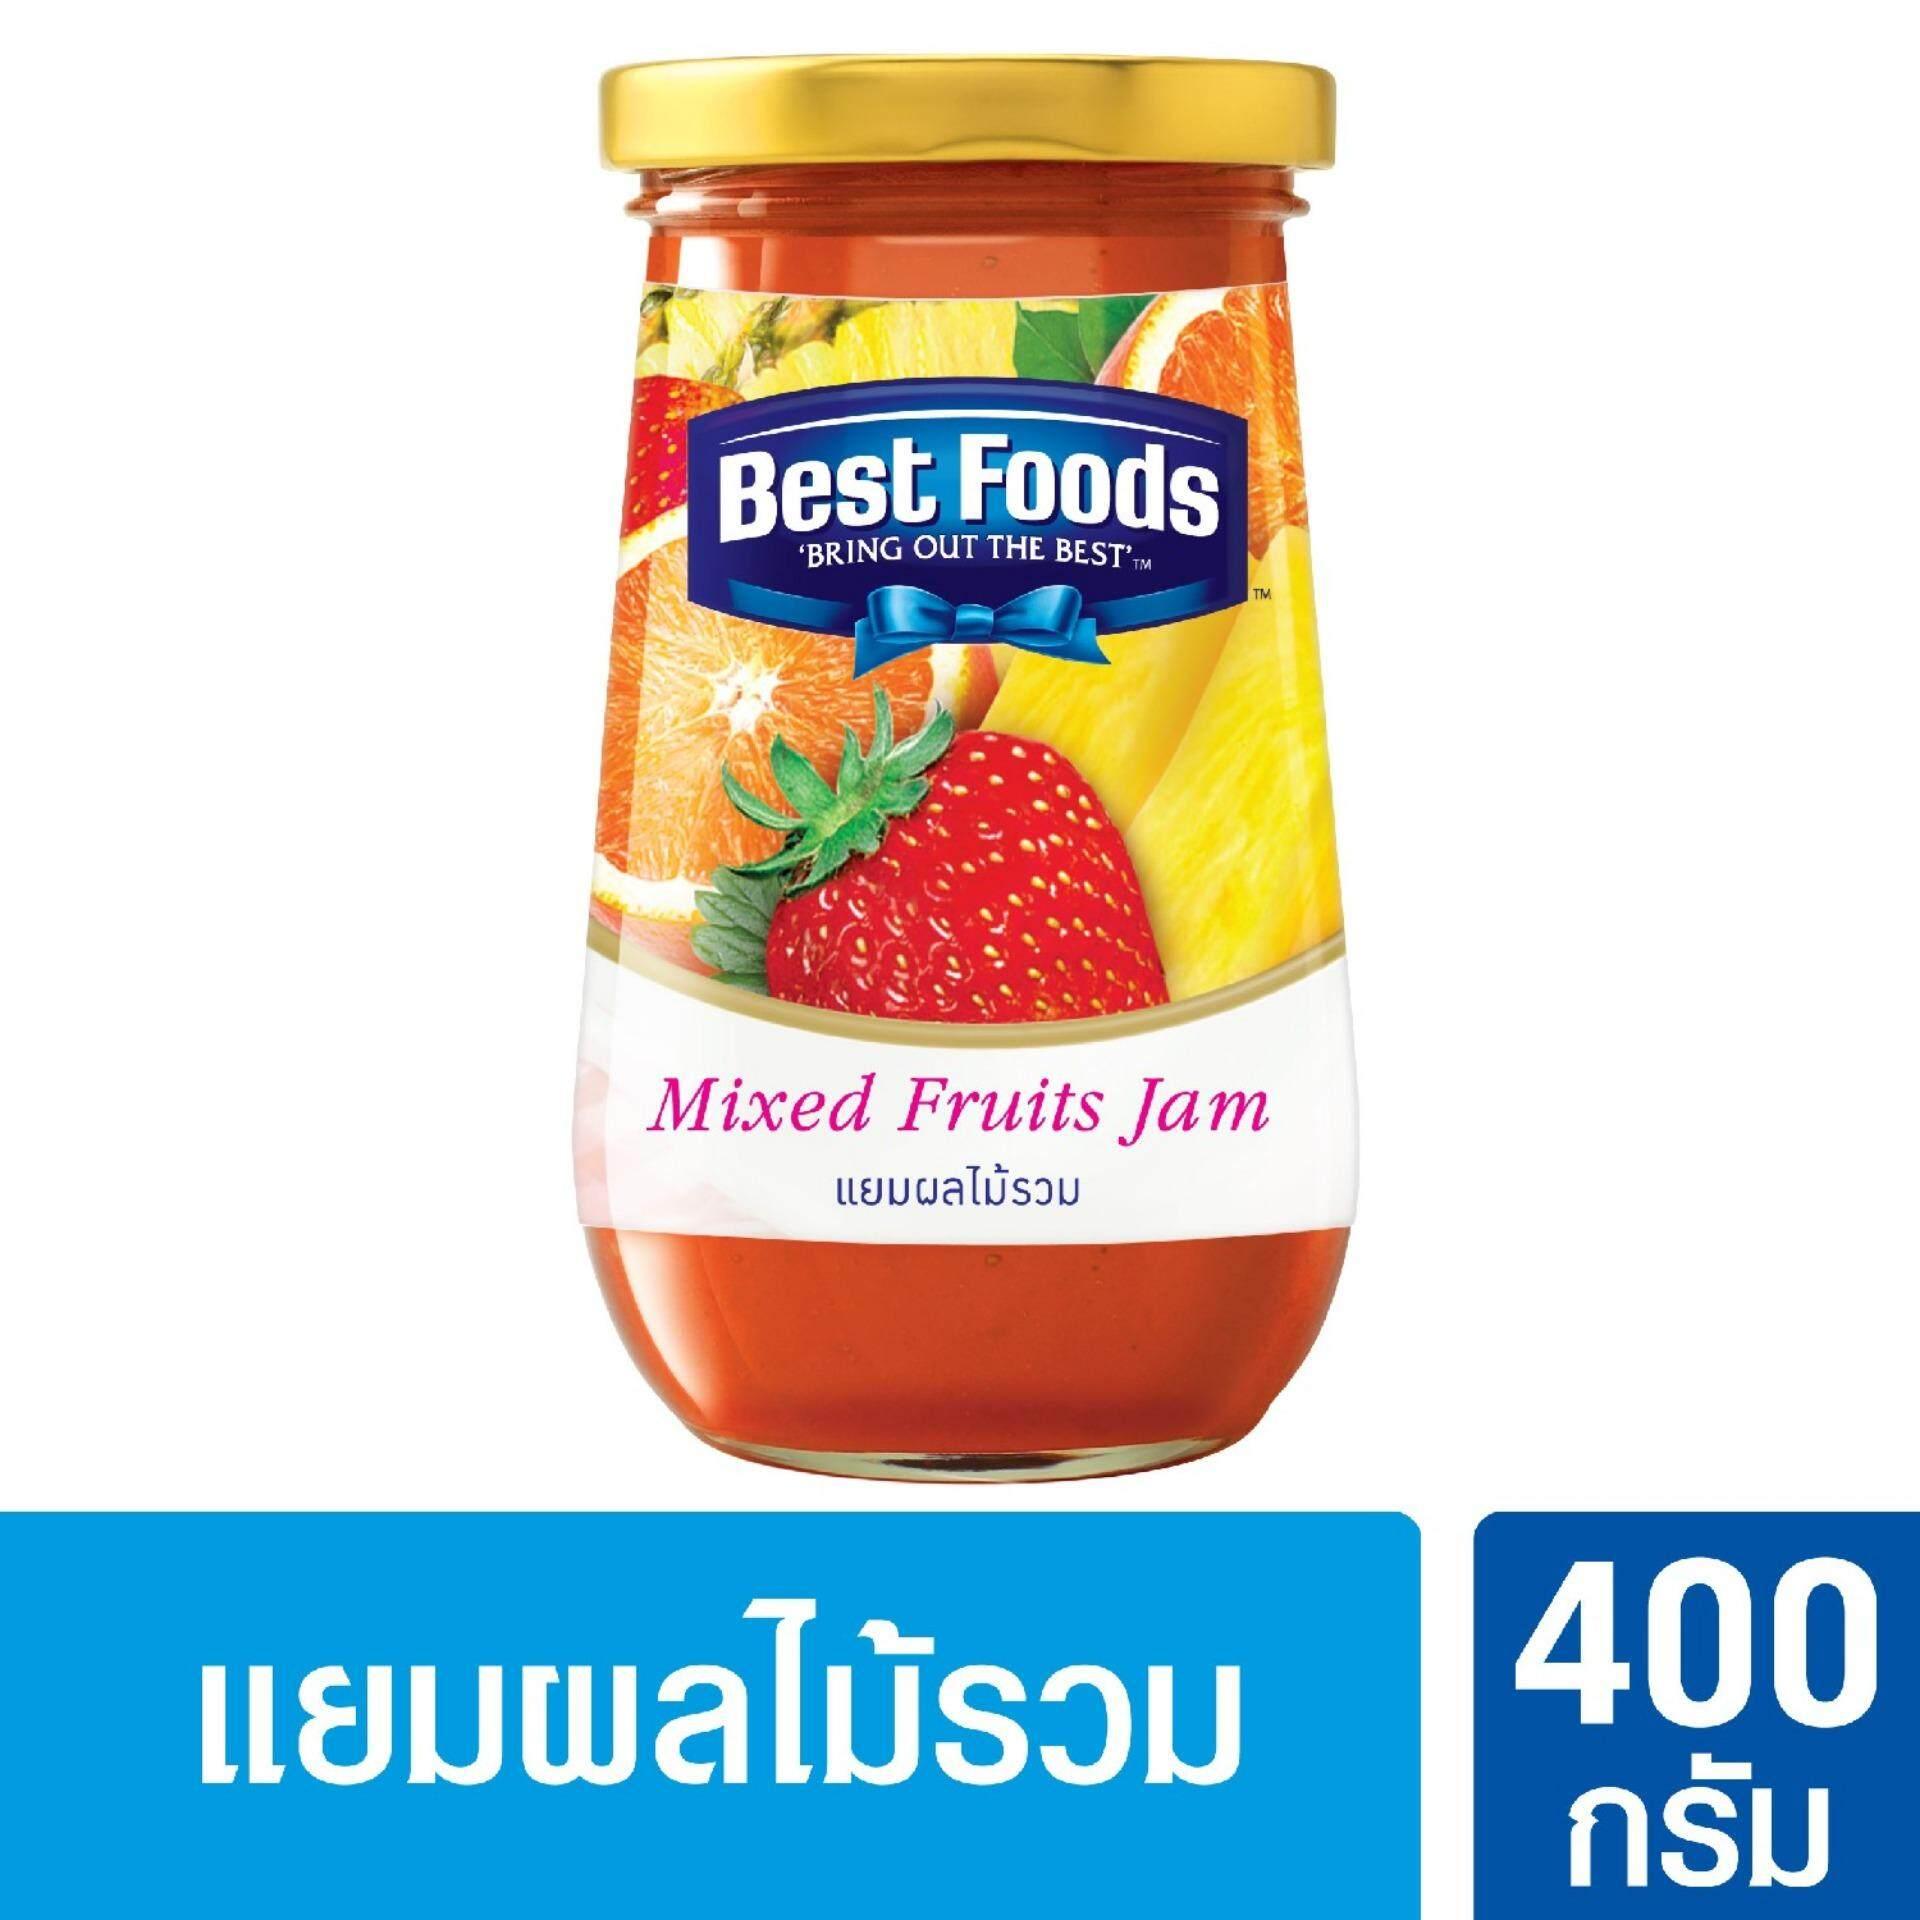 Best Foods เบสท์ฟู้ดส์ แยมผลไม้รวม 400กรัม